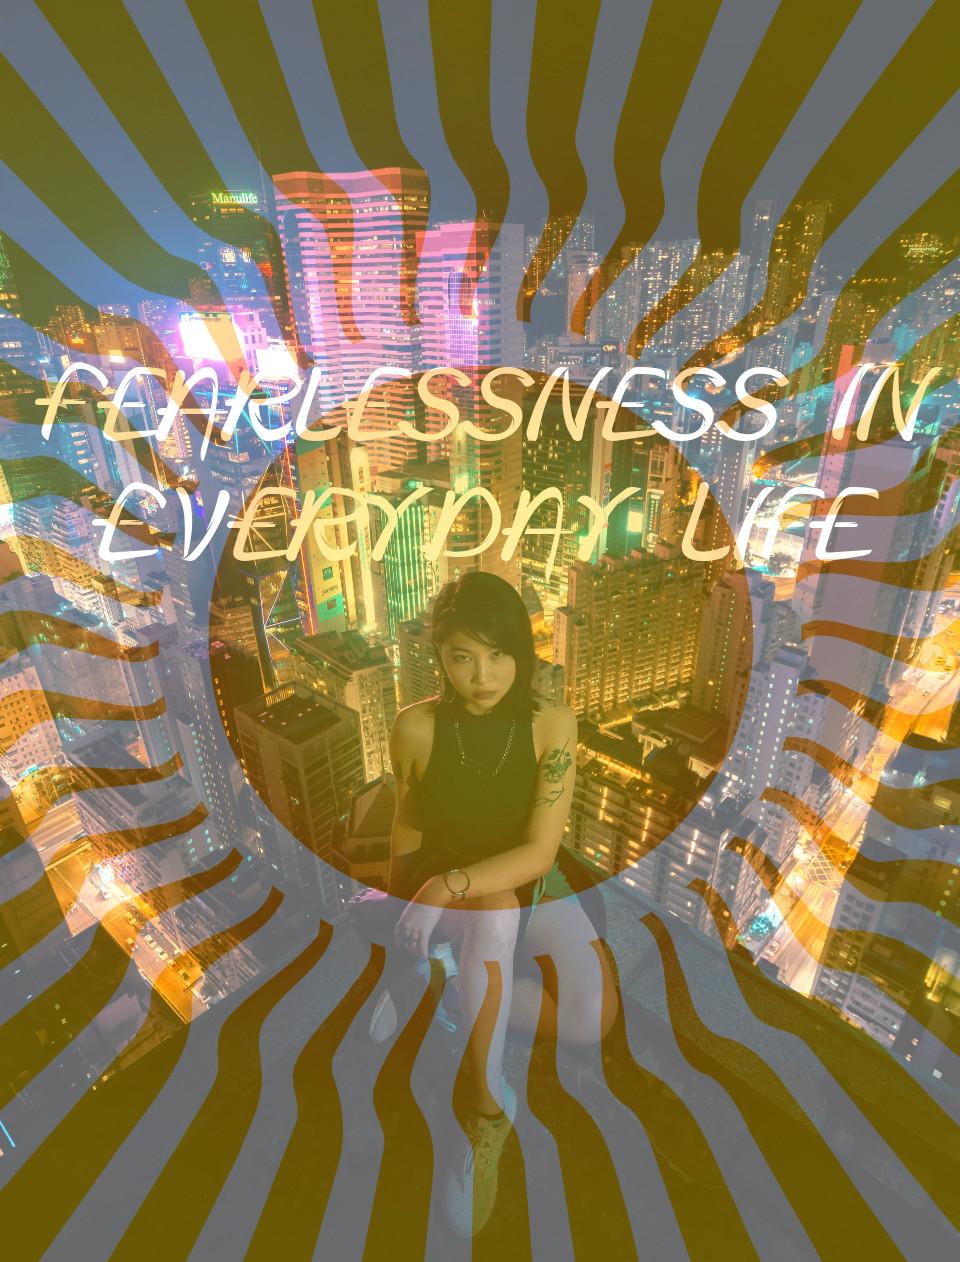 Bangkok/Fearlessness_in_Everyday_Life.jpg